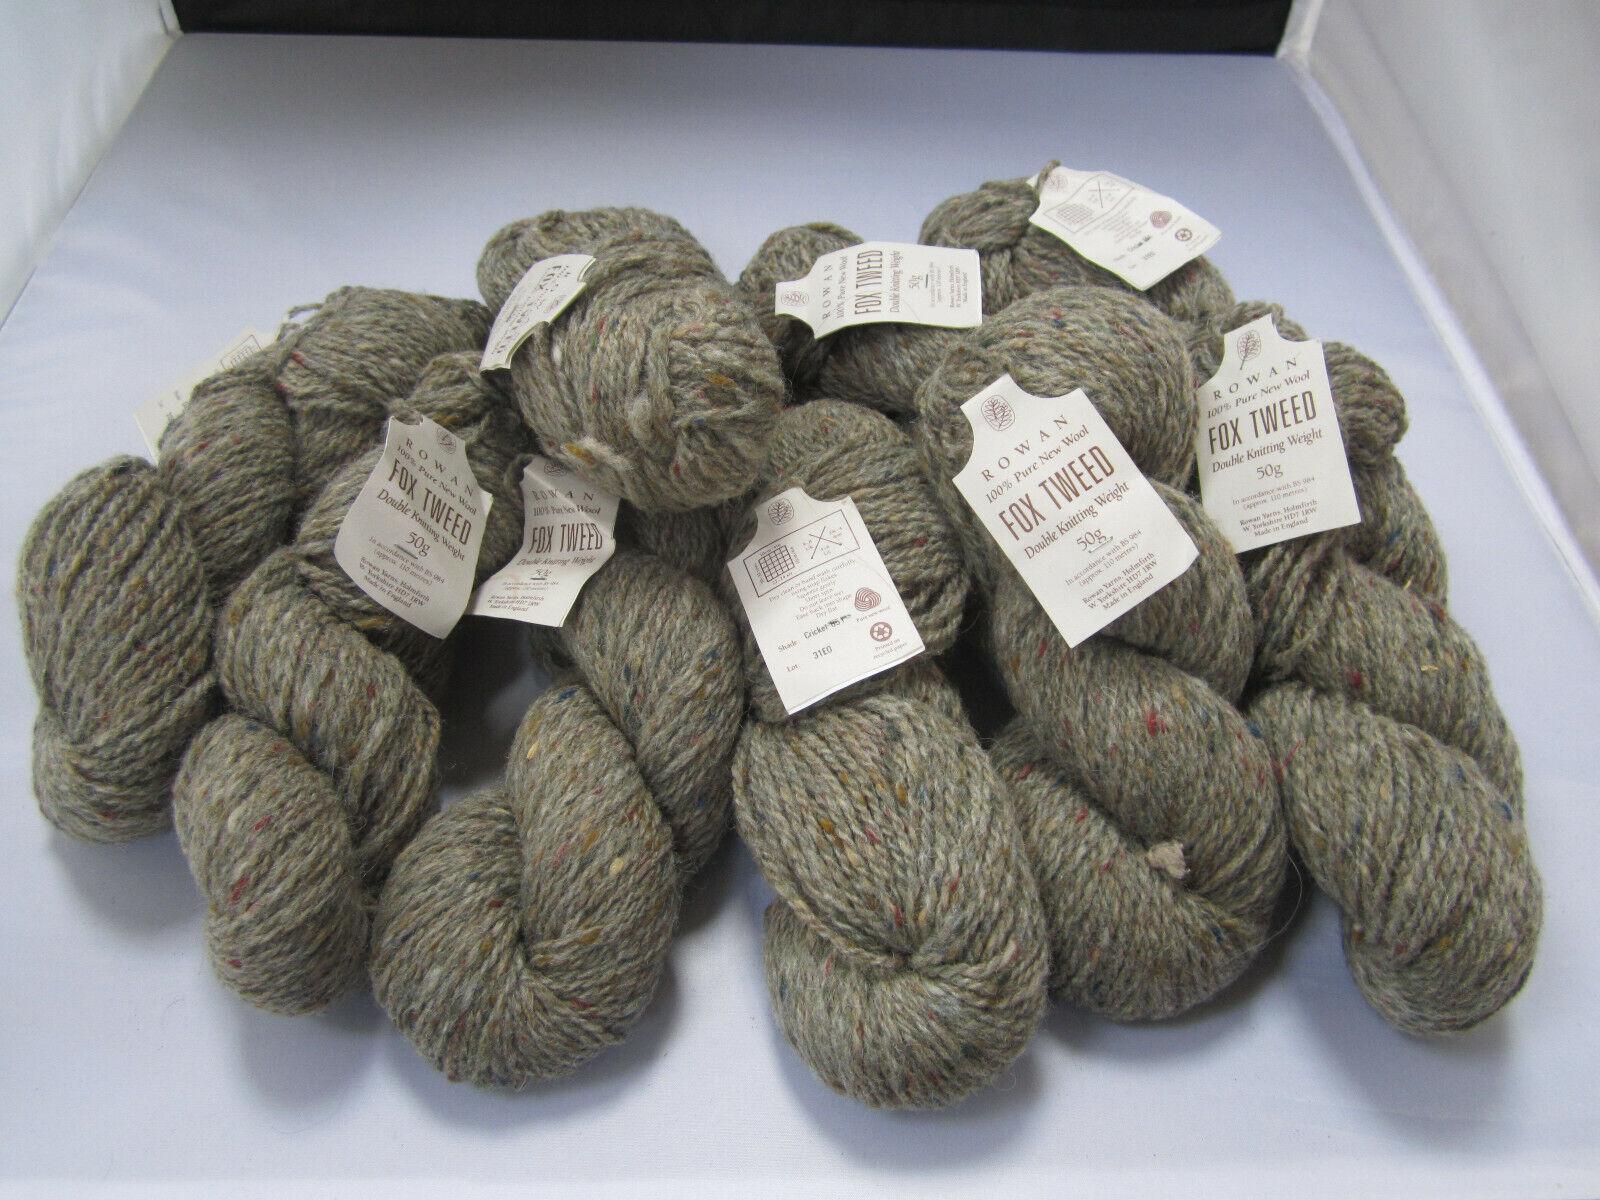 RowanDK Fox Tweed yarn 9 skeins